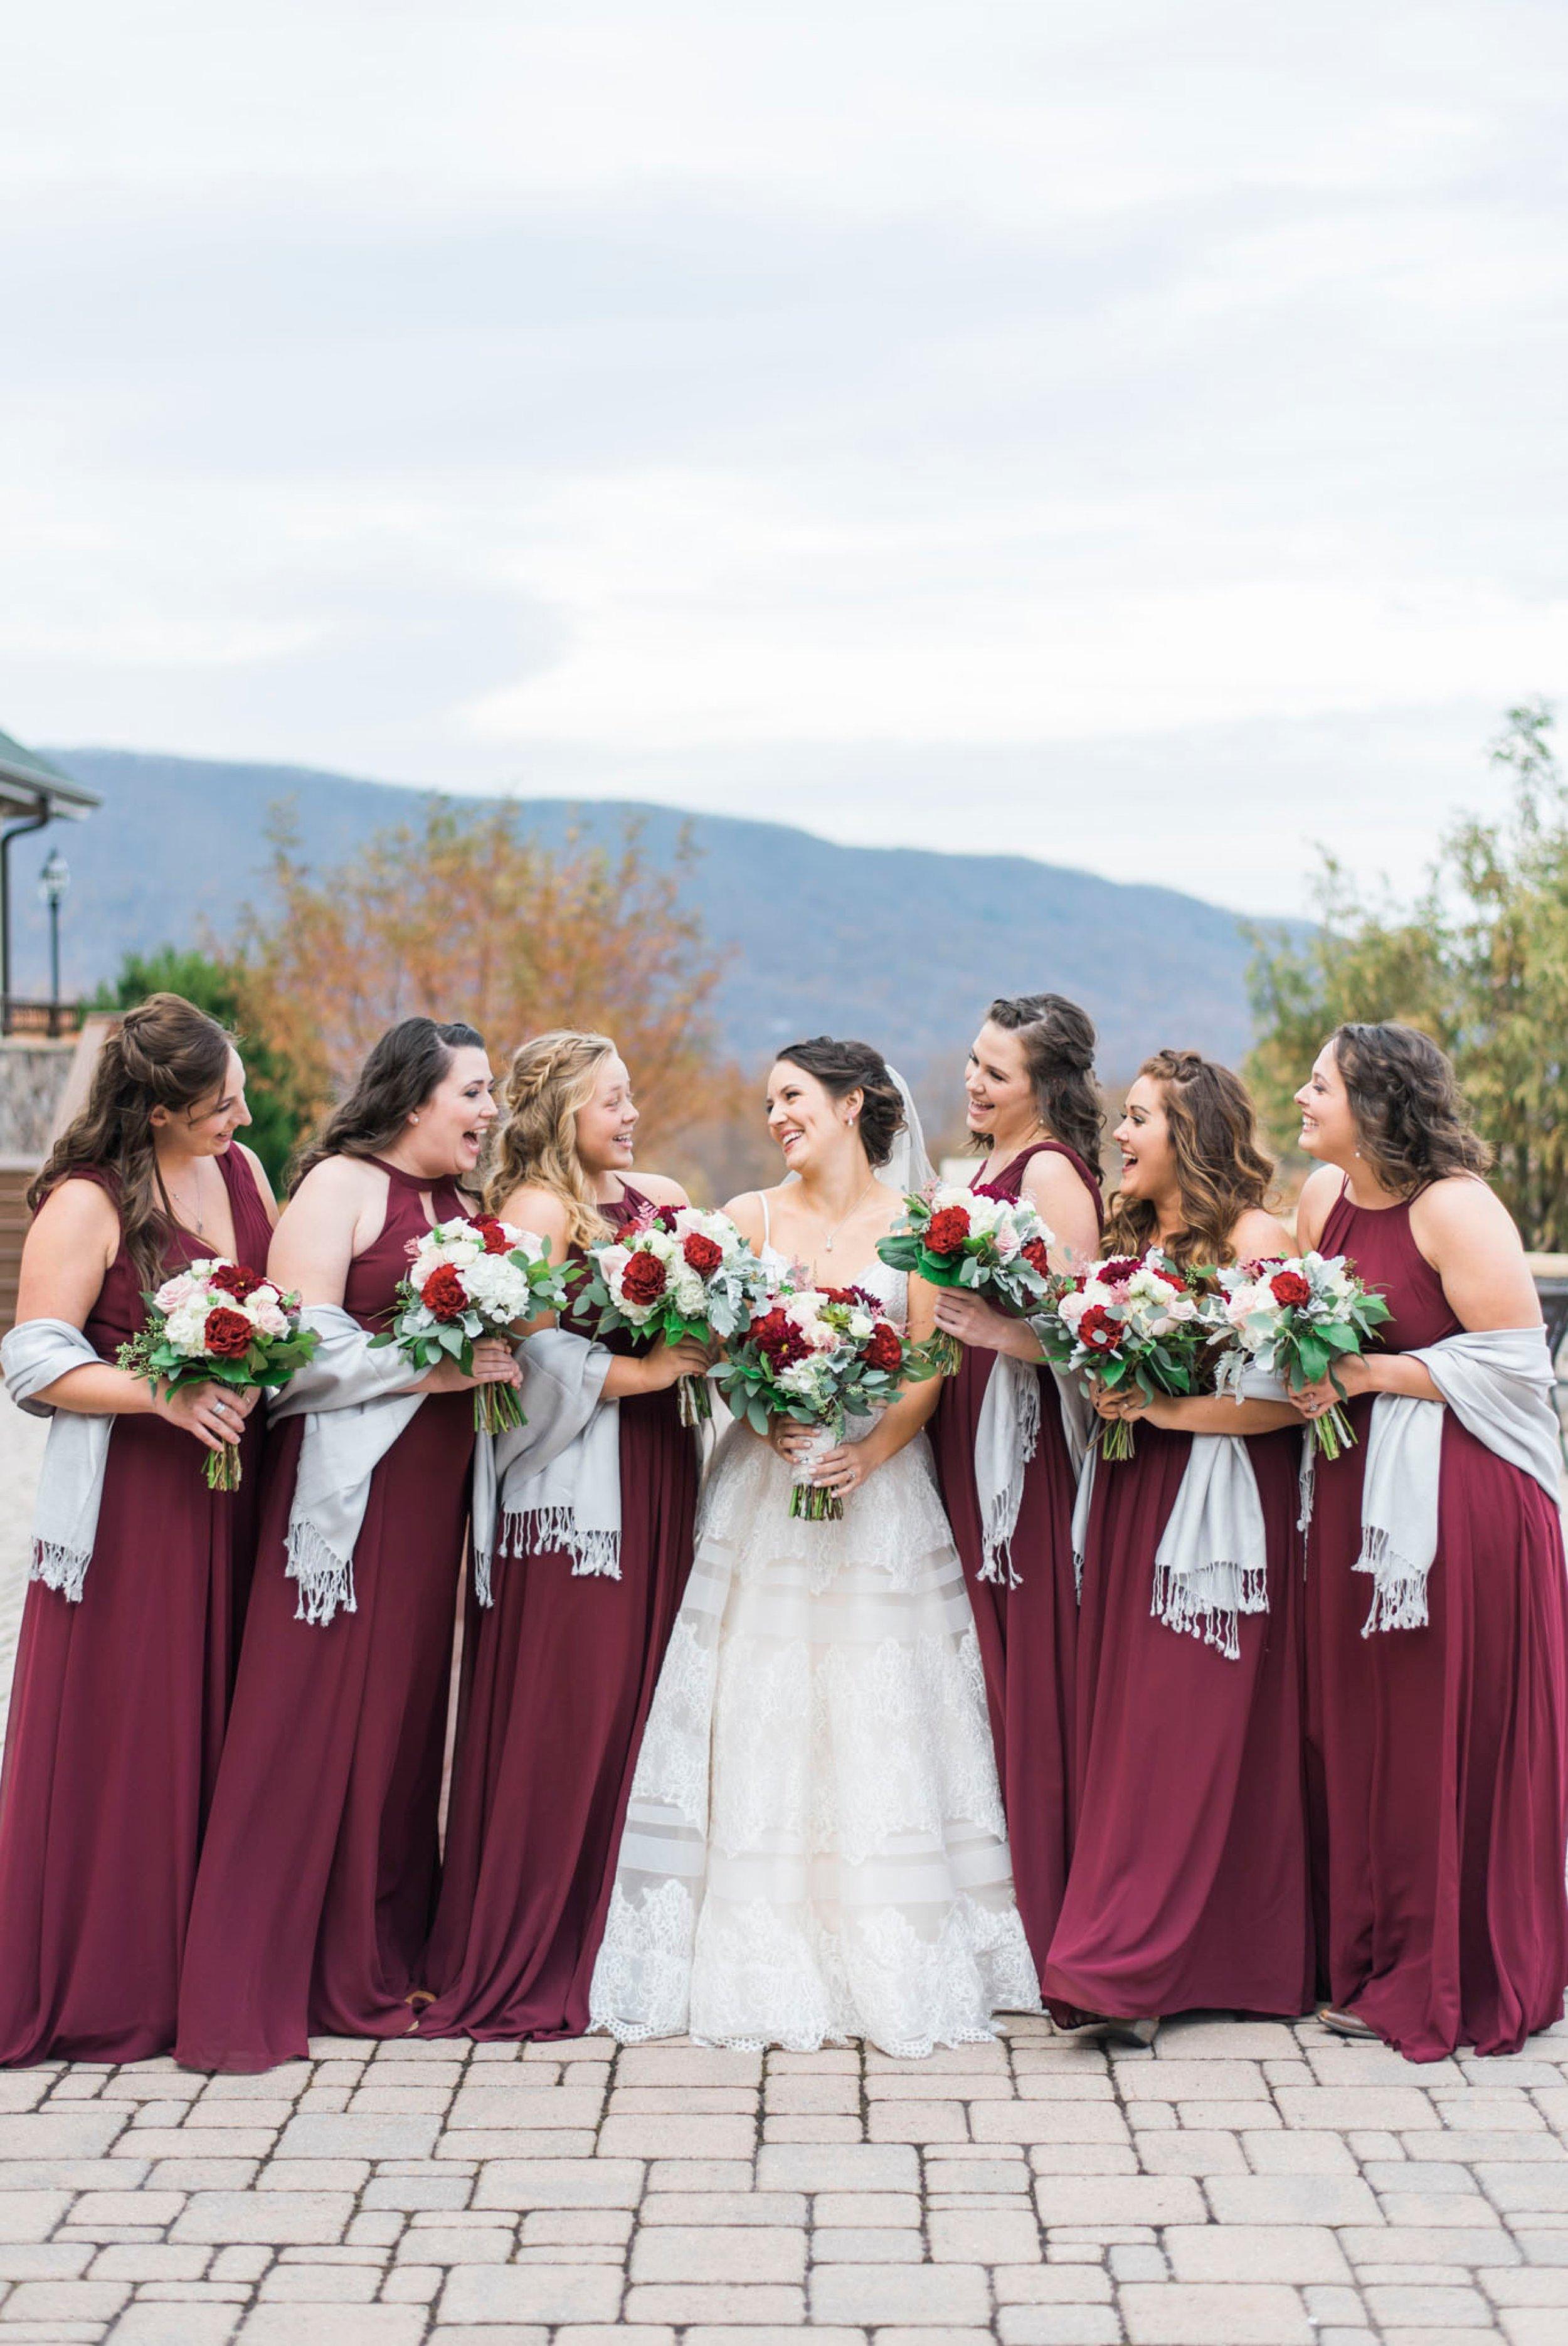 IrvineEstate_LexingtonVA_Wedding_FallWedding_VirginiaWeddingPhotographer 37.jpg